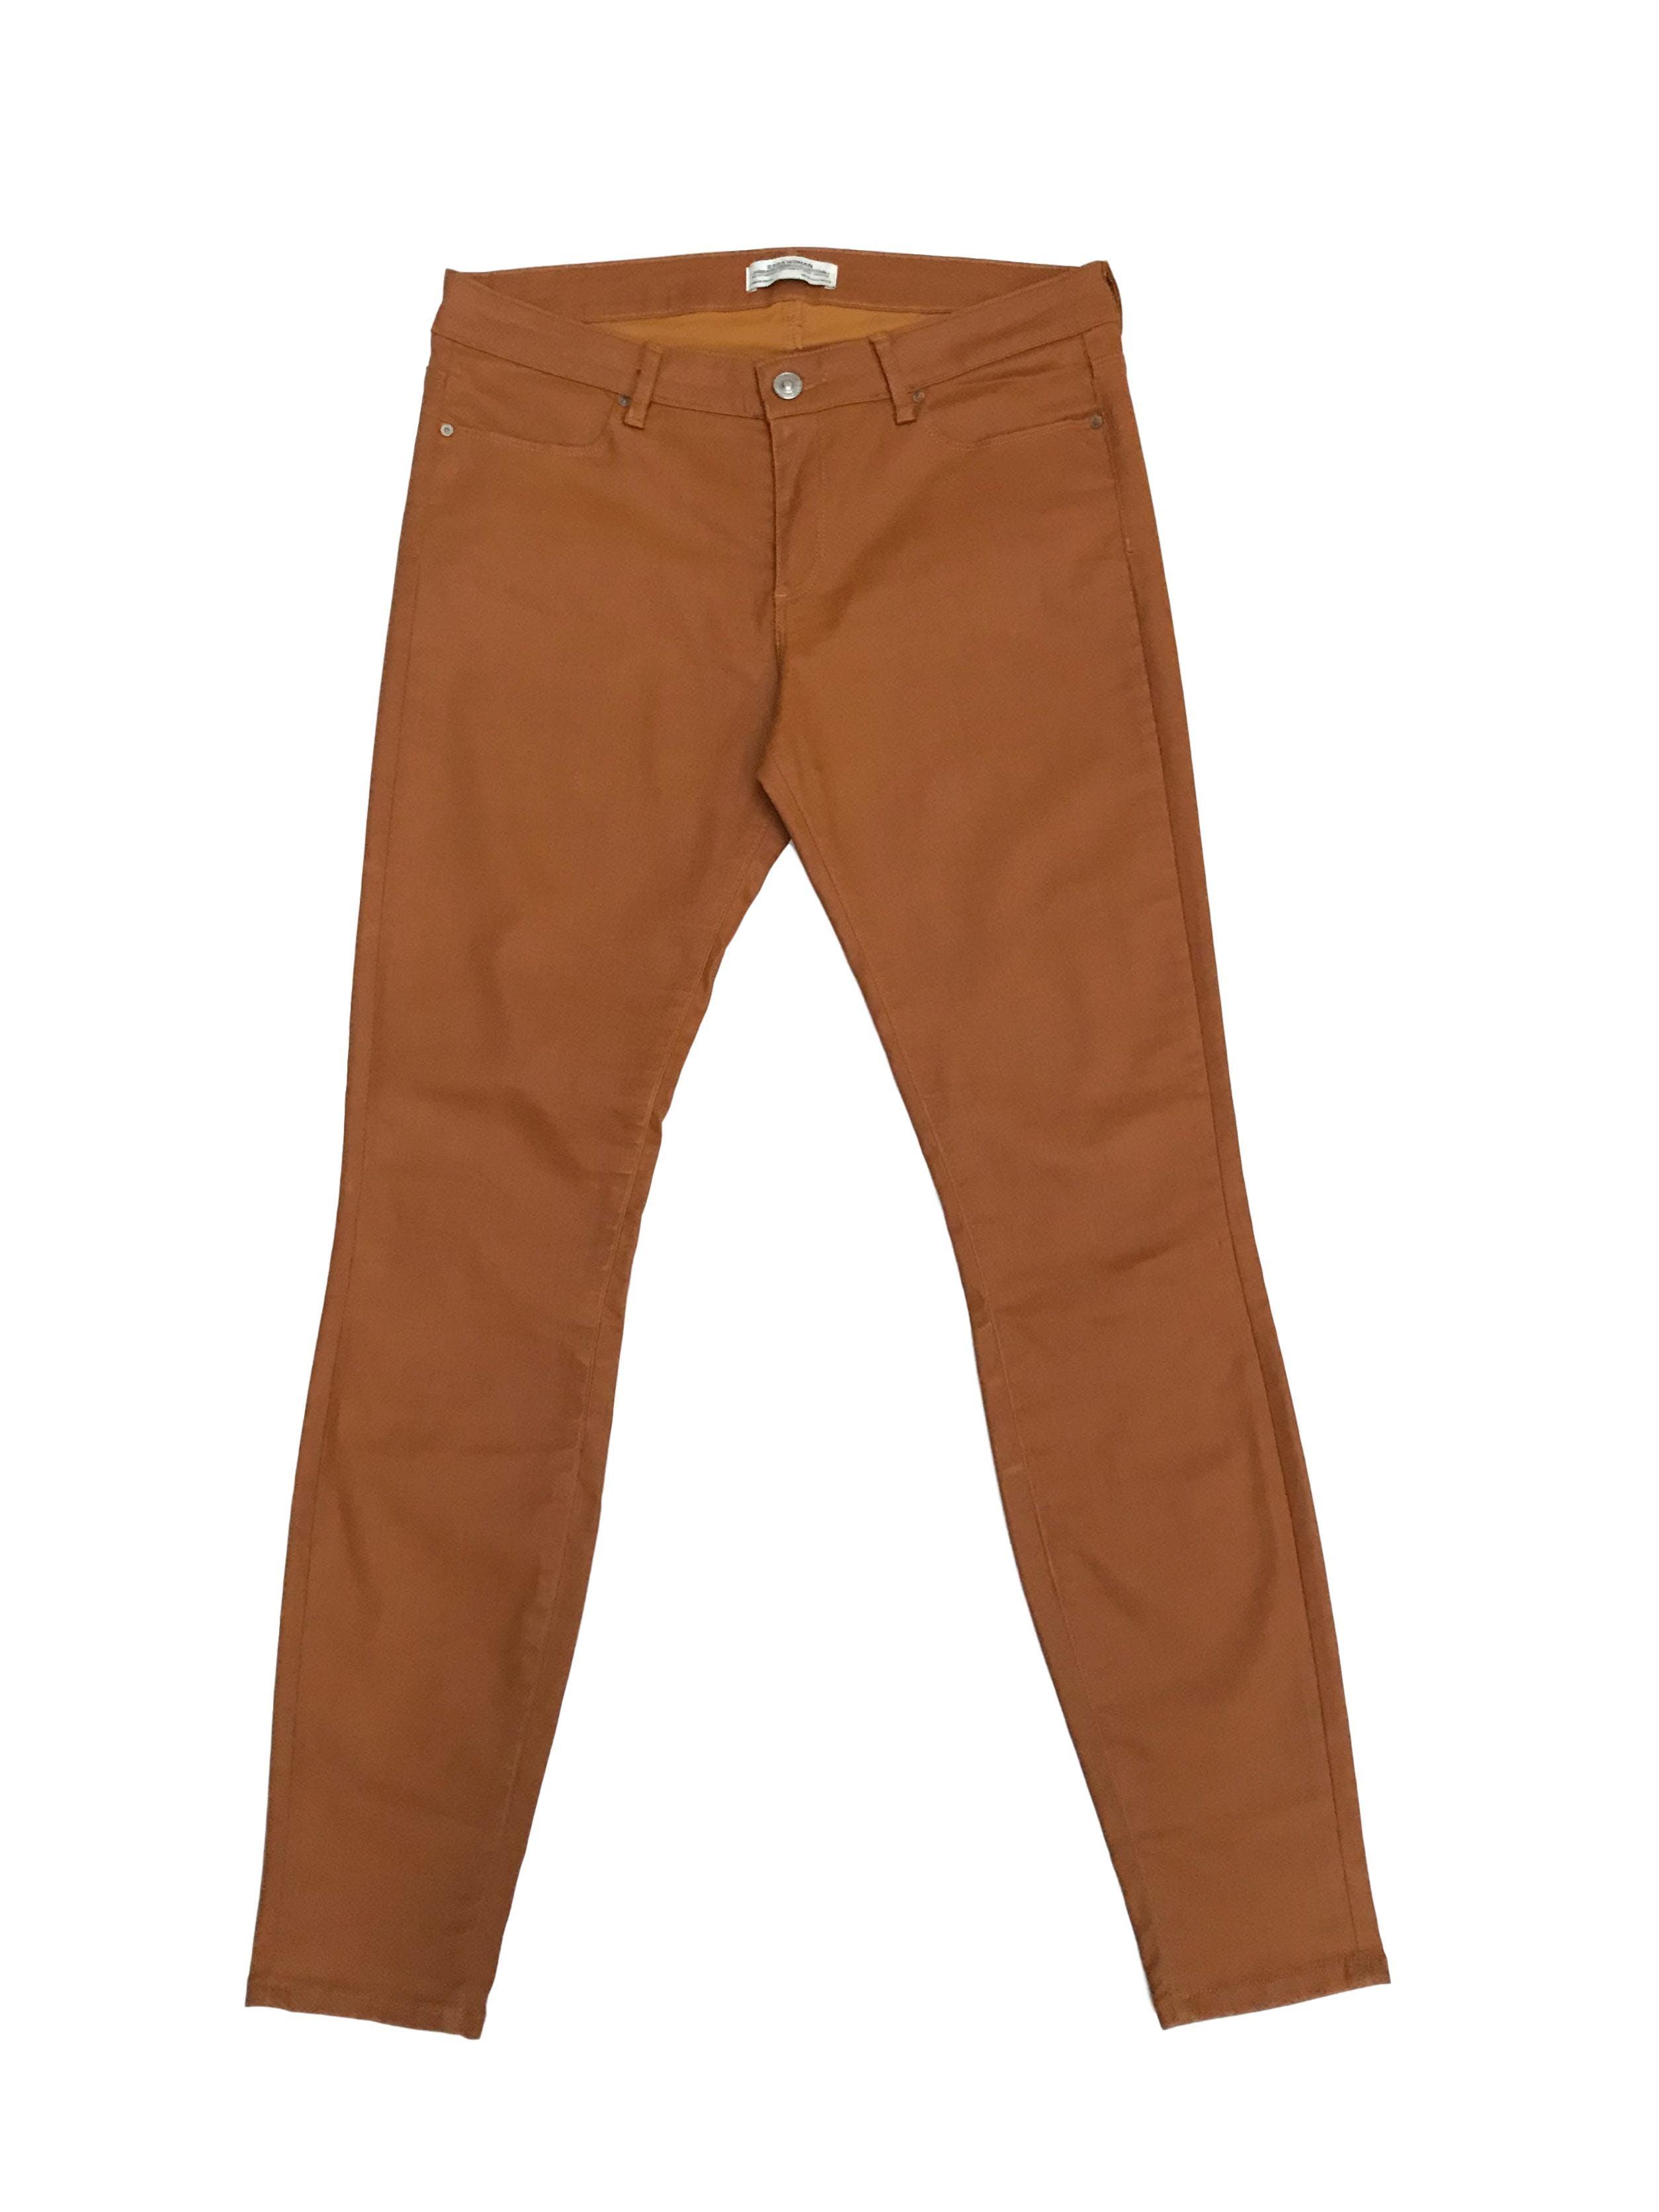 Pantalón Zara efecto cuero camel. Pretina 74cm